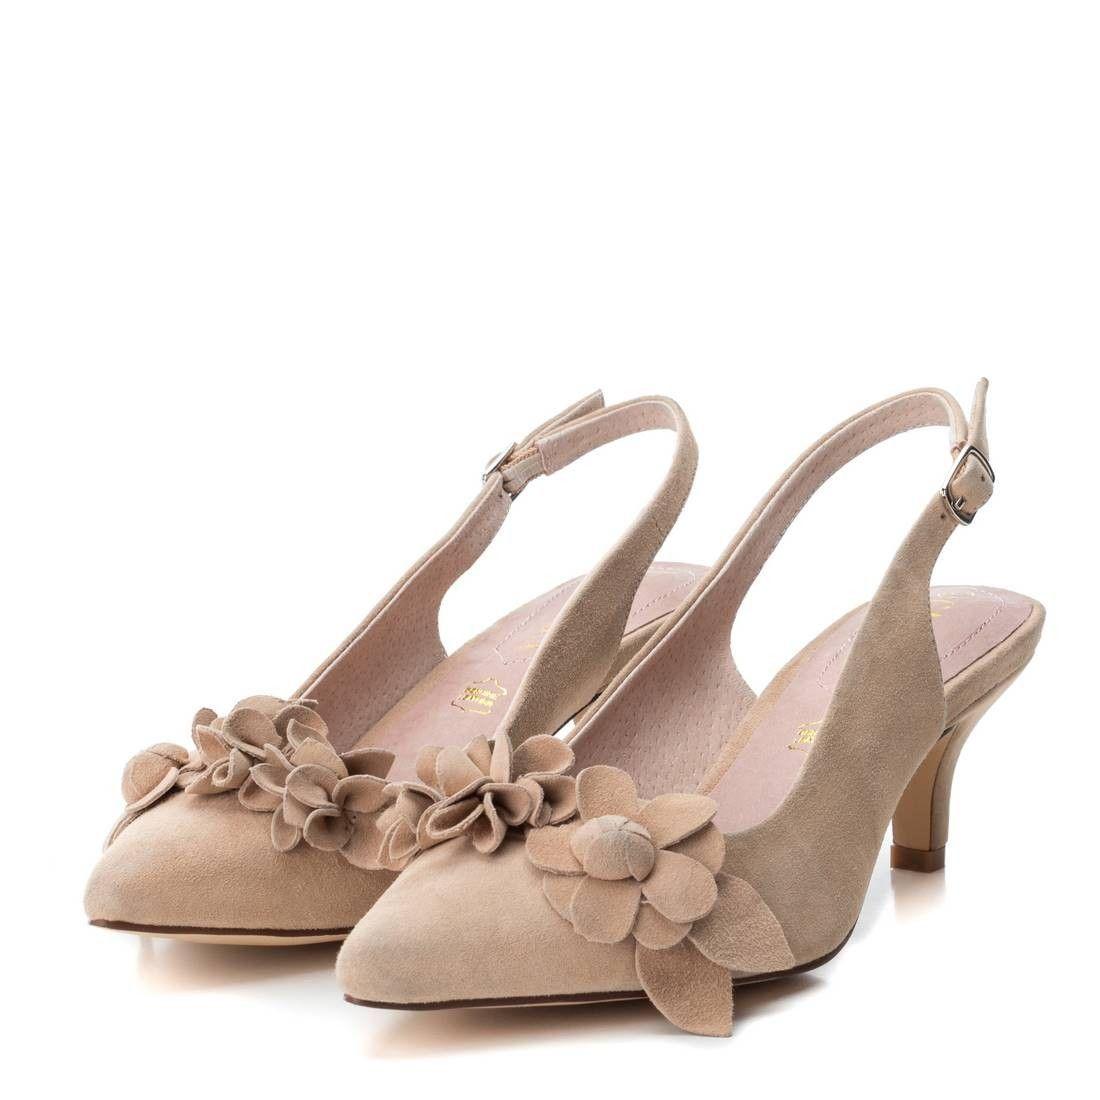 Zapato Calzadosamp; Hebilla Piel 66688 Deportes Carmela Mujer Luciano XilwZTOPuk